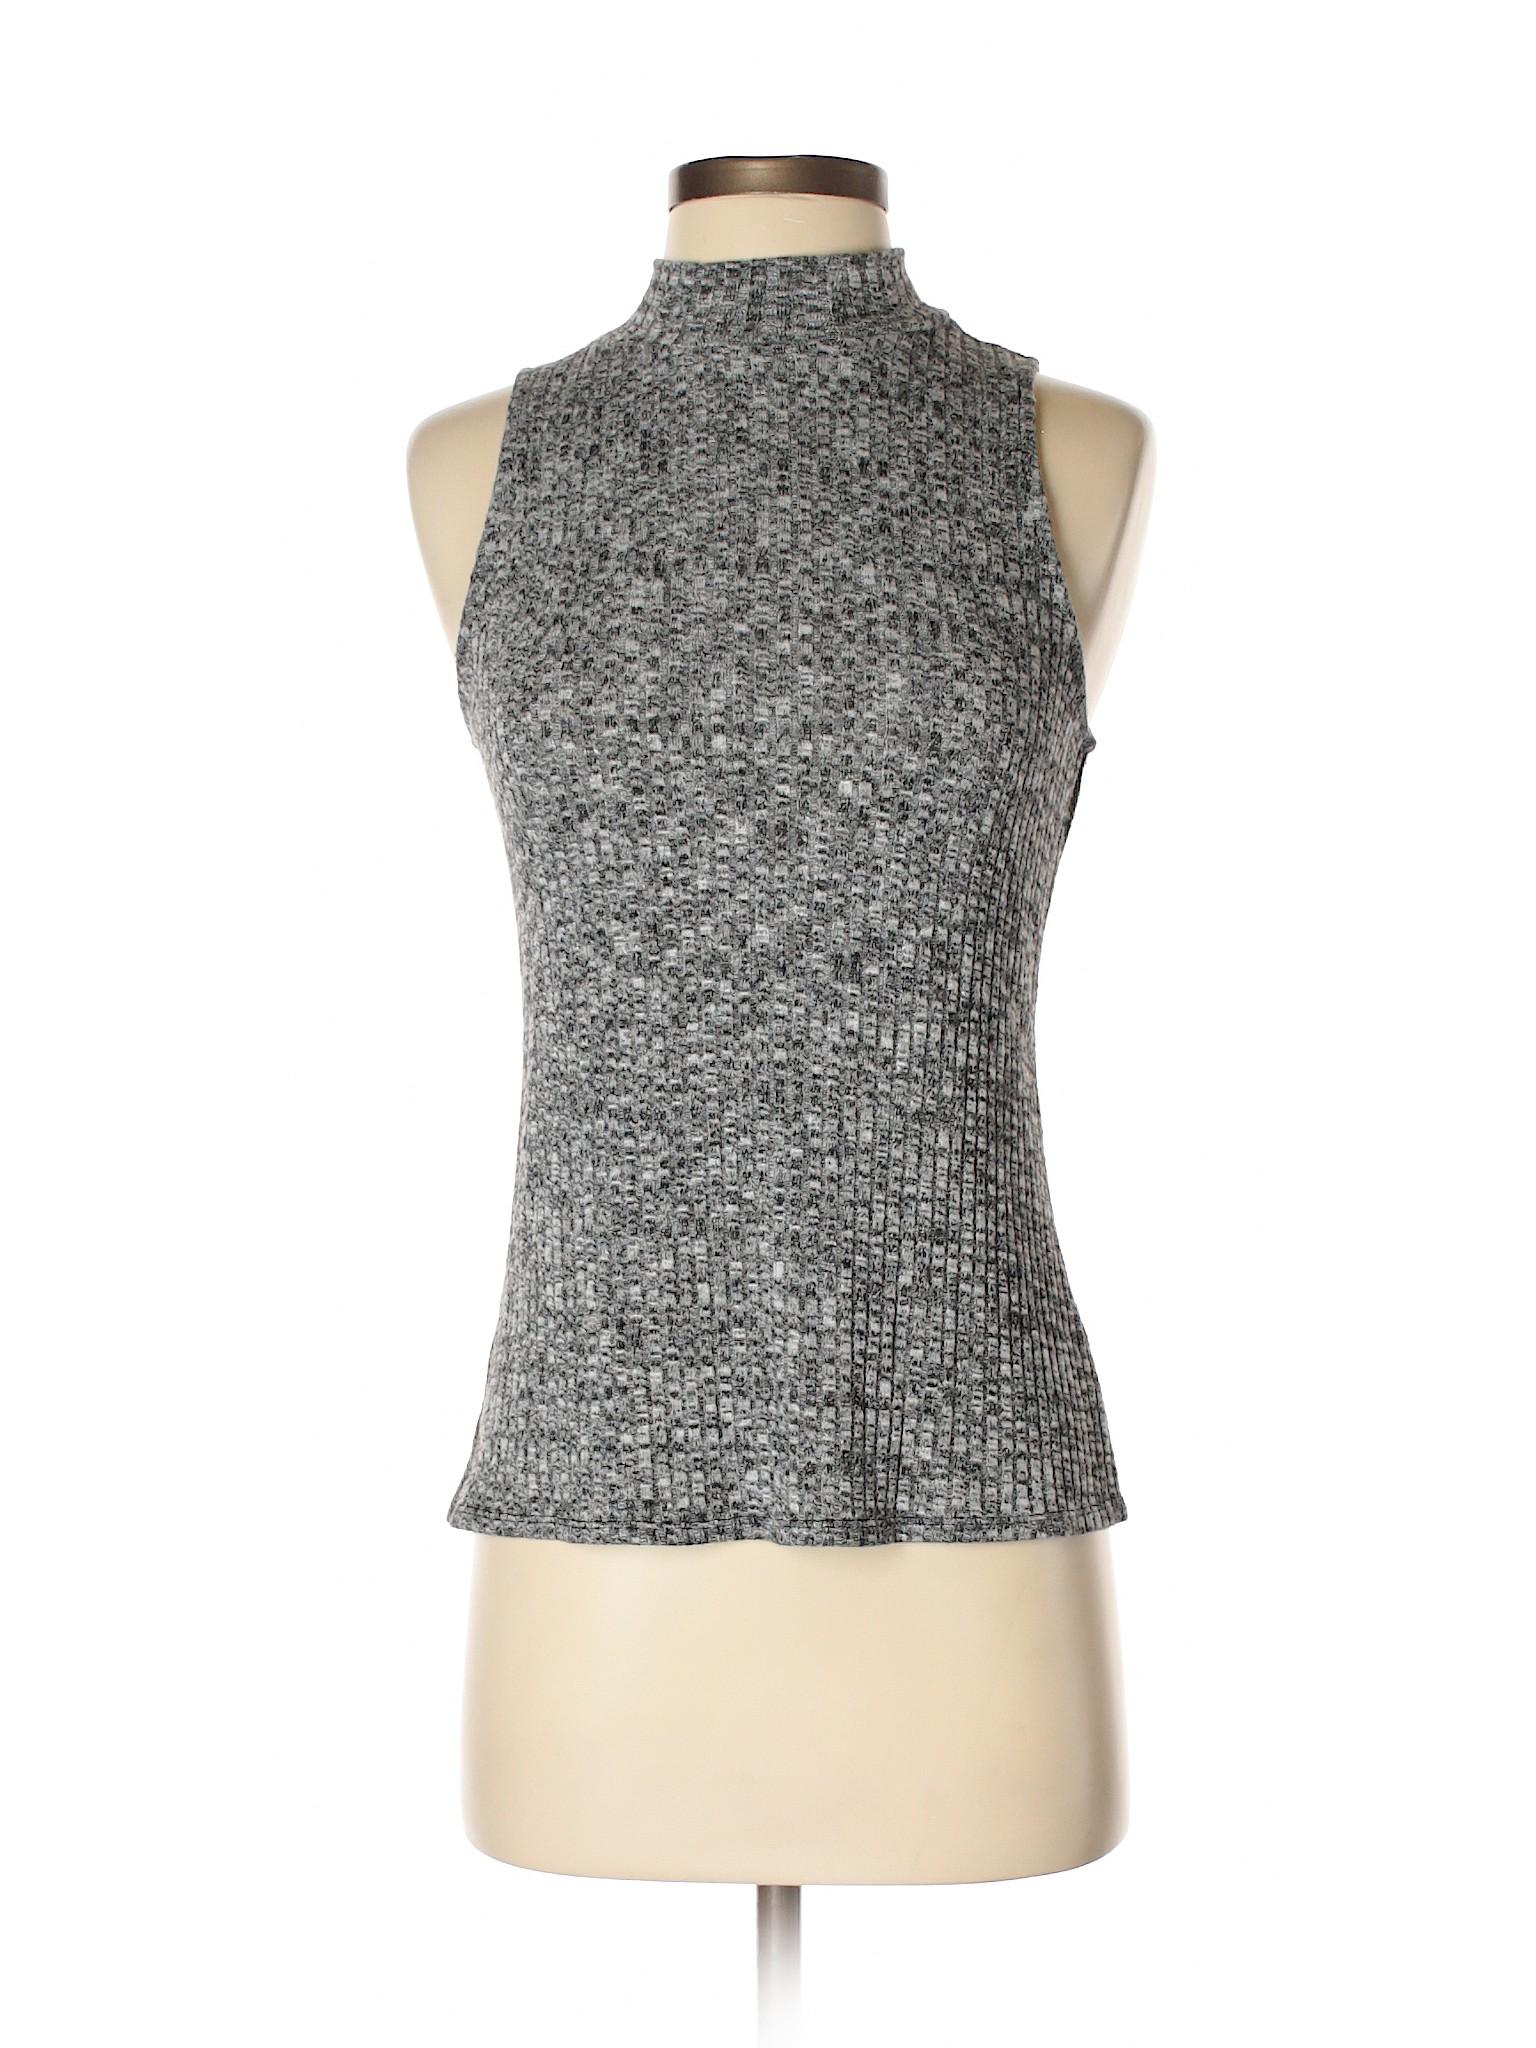 Boutique Sweater Pullover Boutique Kensie Kensie vwq0q76O